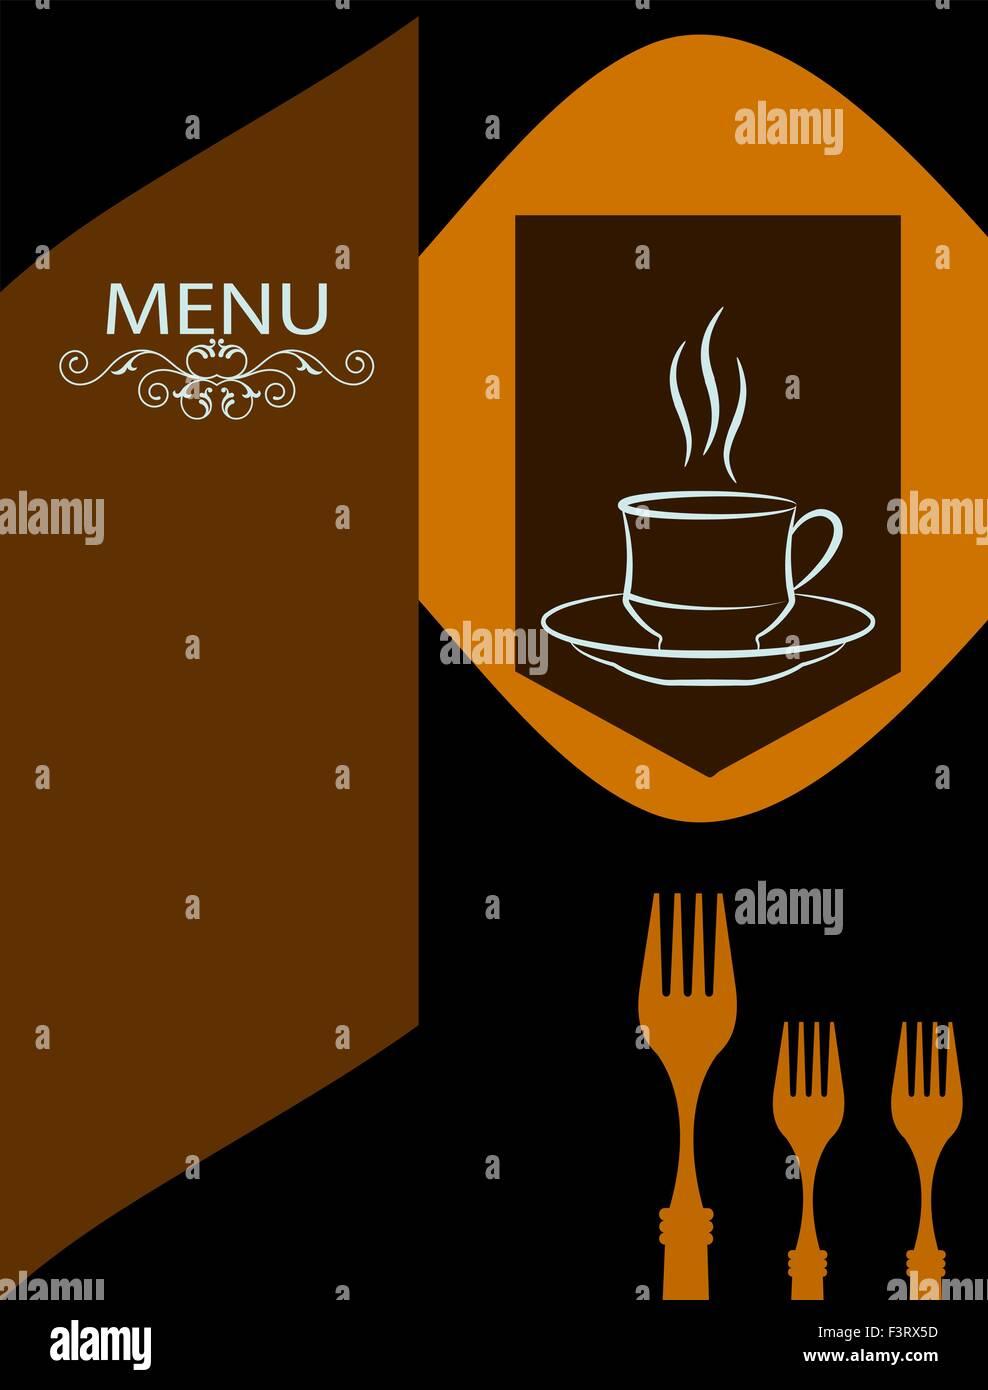 Kaffee-Menü Karte Design Vorlage Vektorgrafiken Vektor Abbildung ...